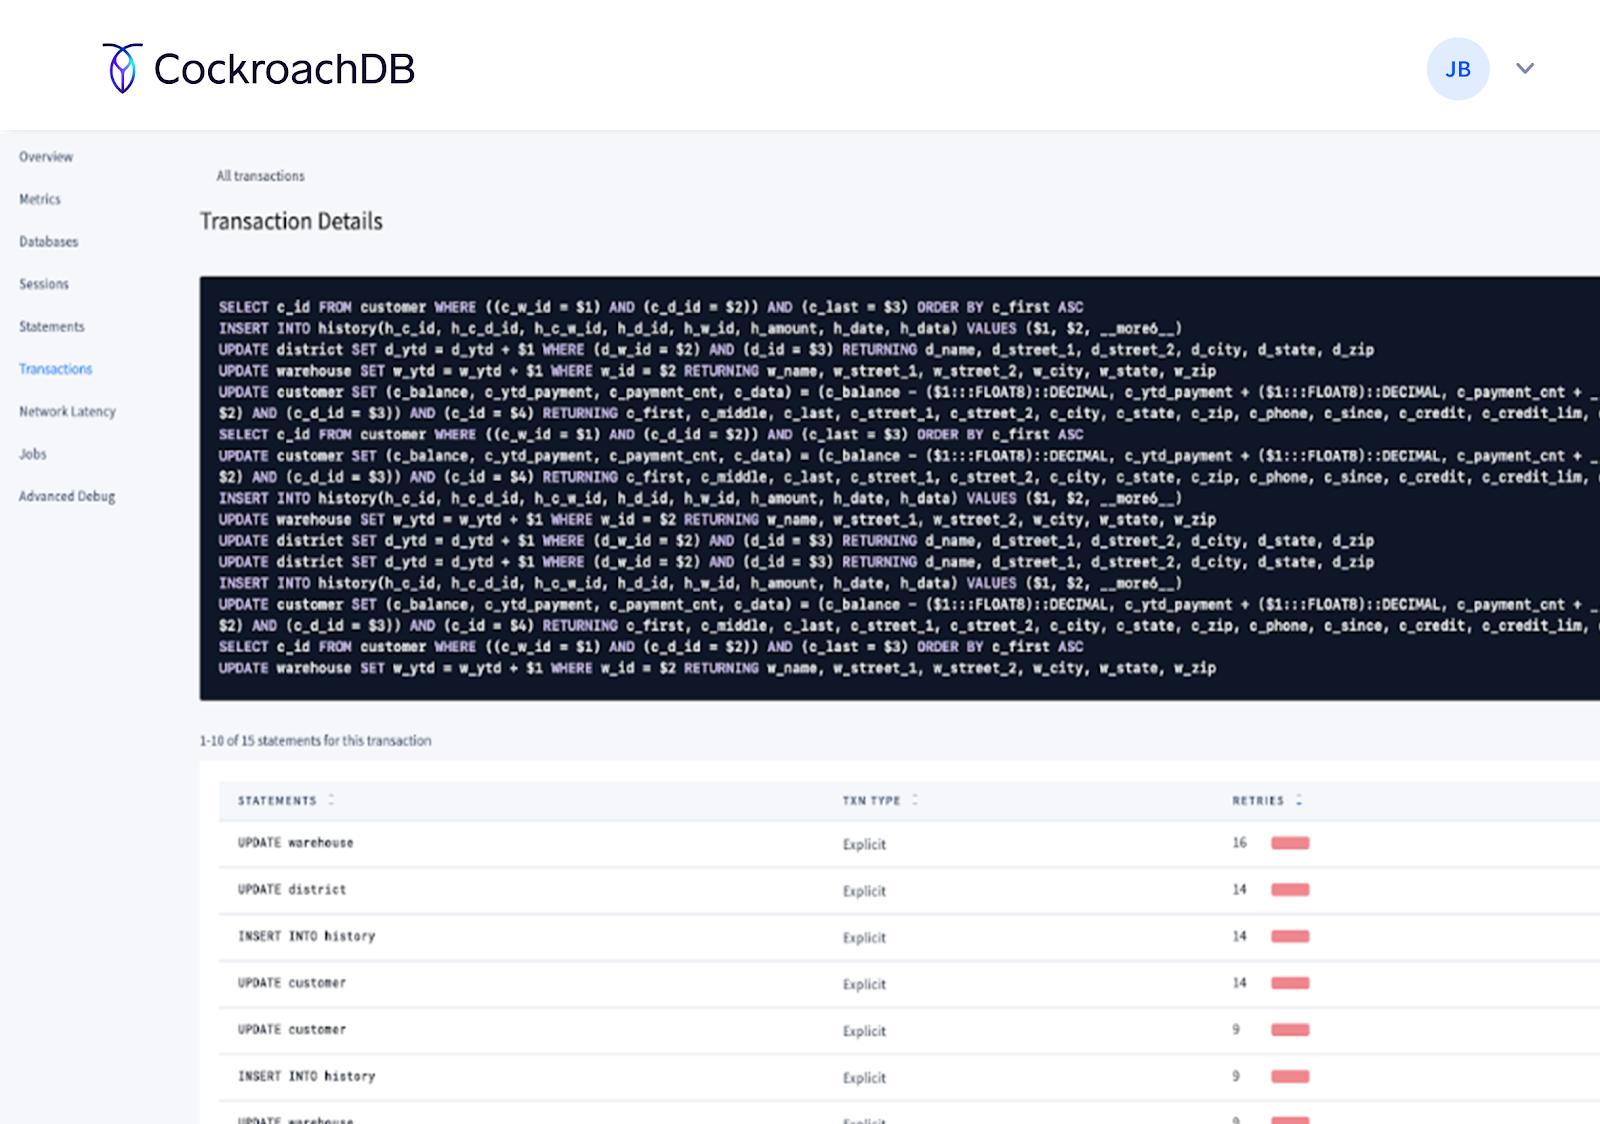 Cockroach DB Console transactions details